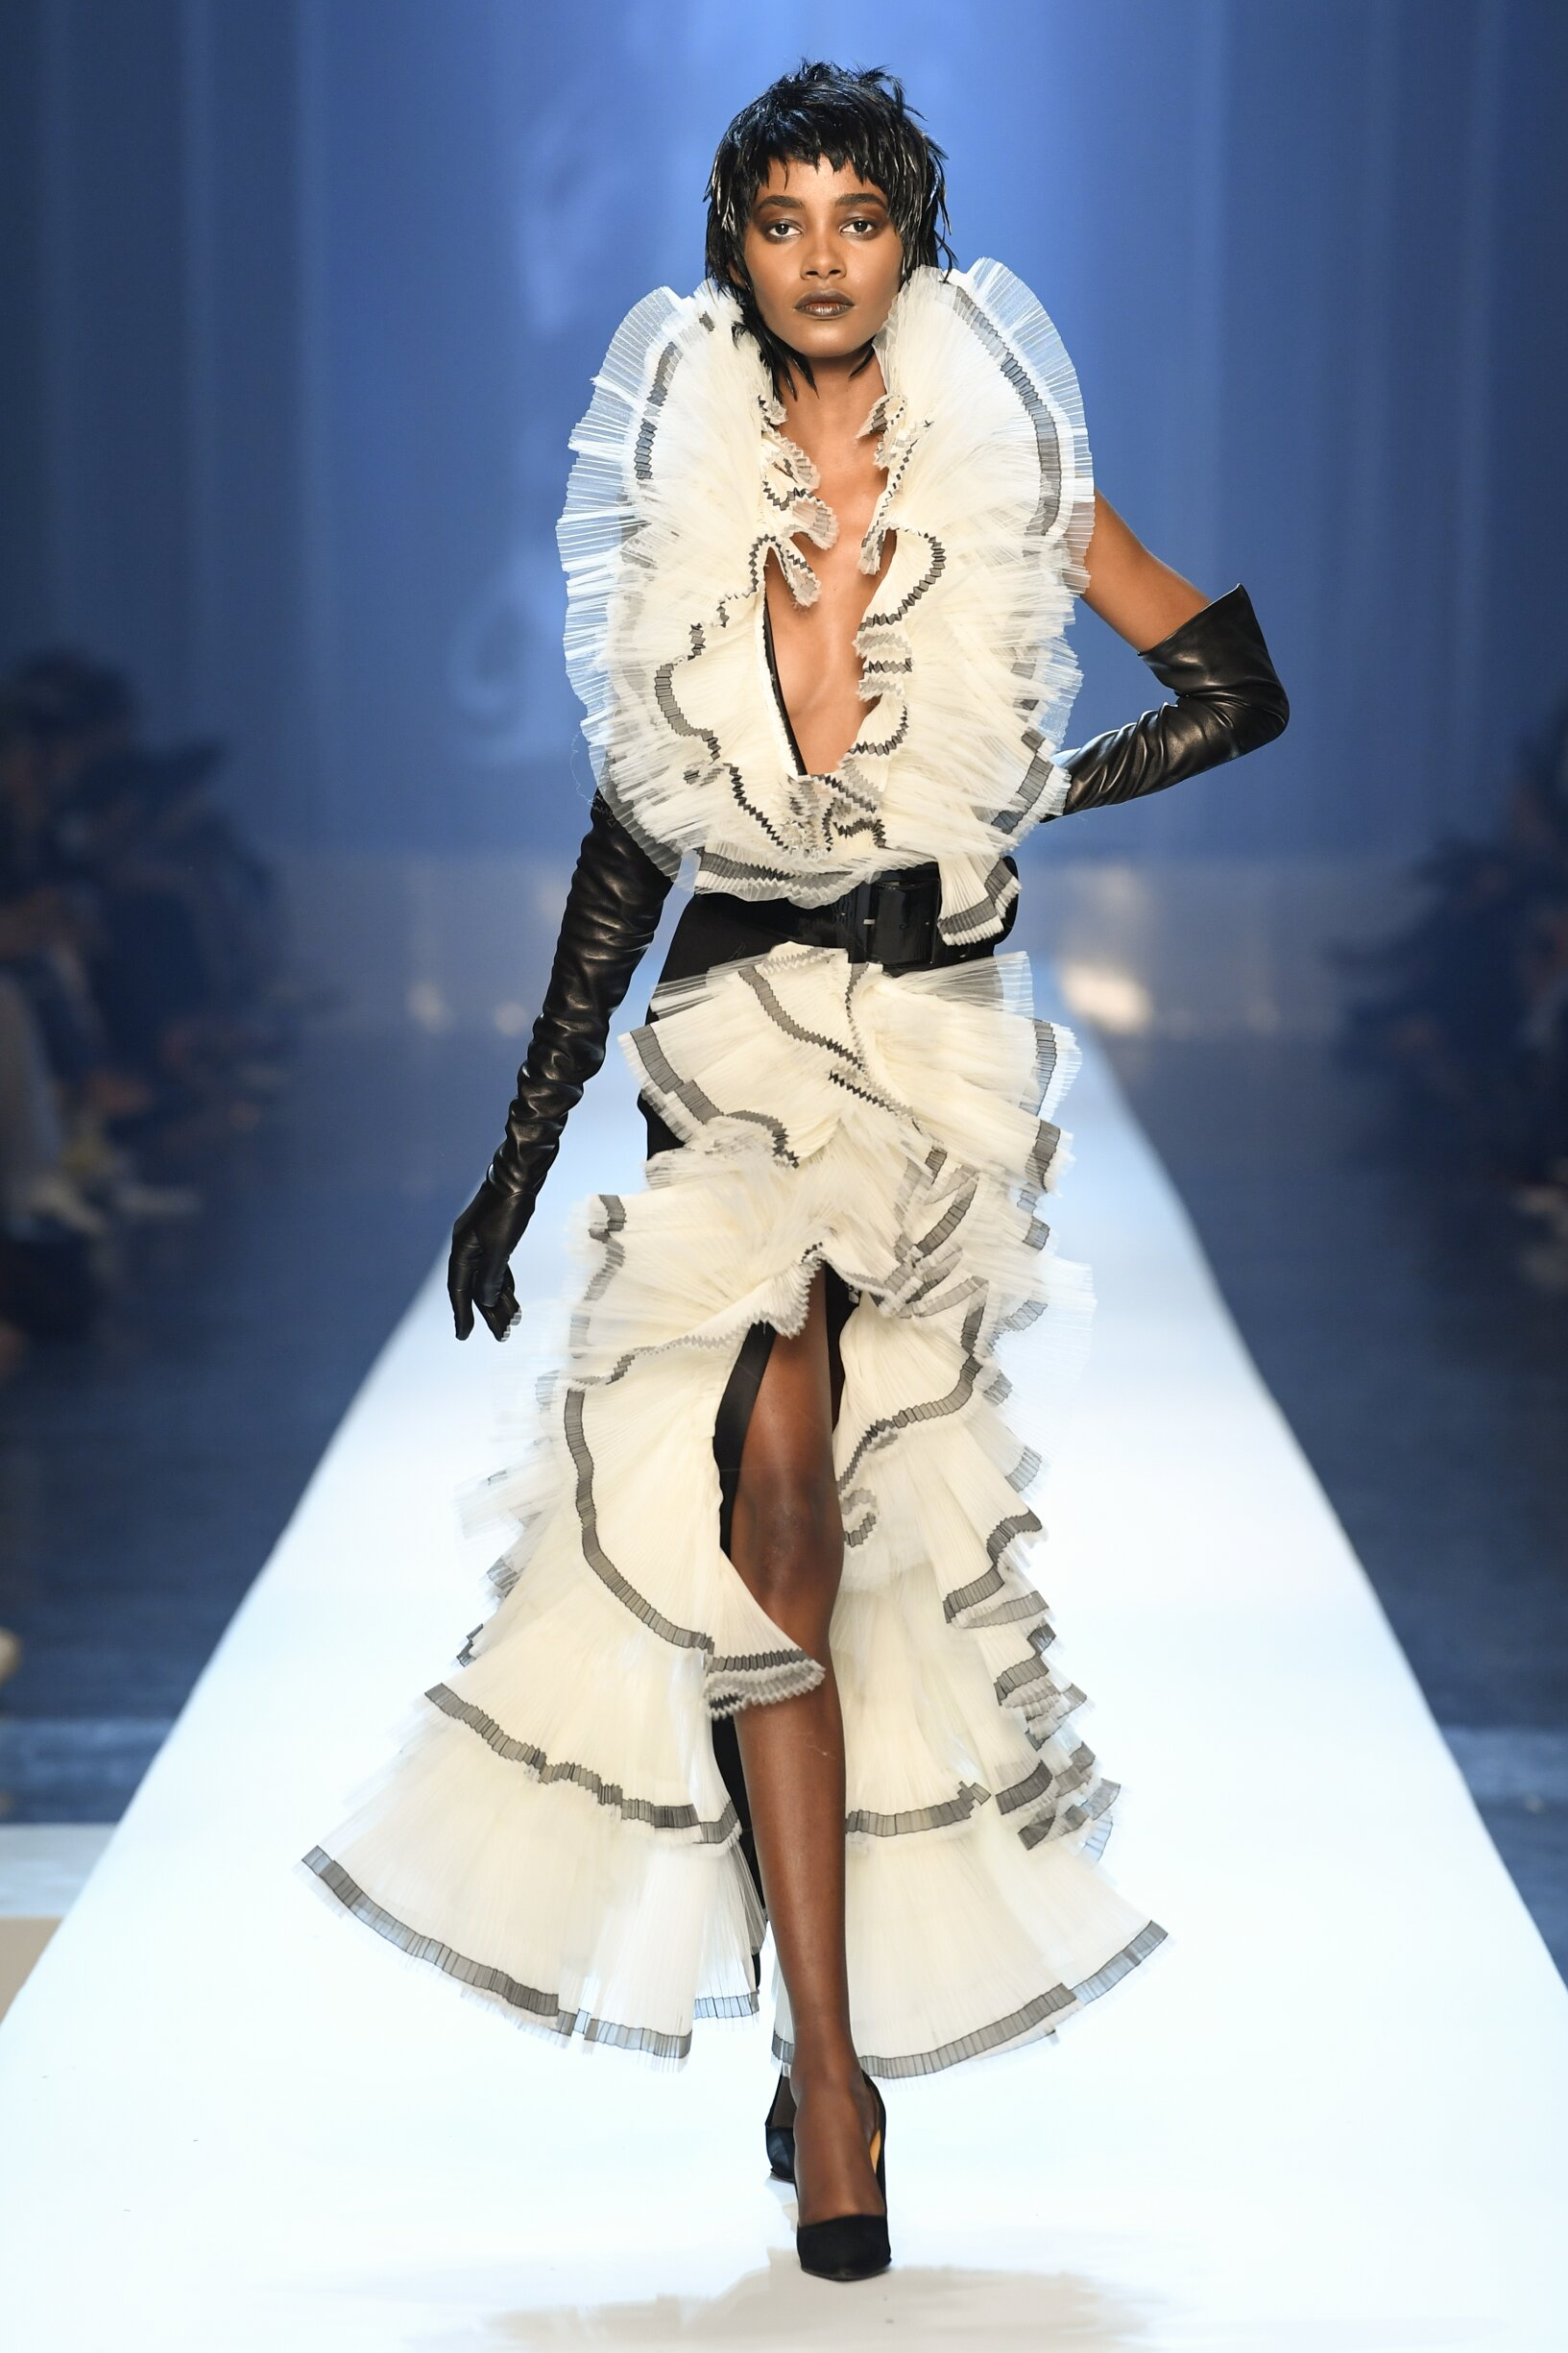 2018 Catwalk Jean-Paul Gaultier Haute Couture Winter